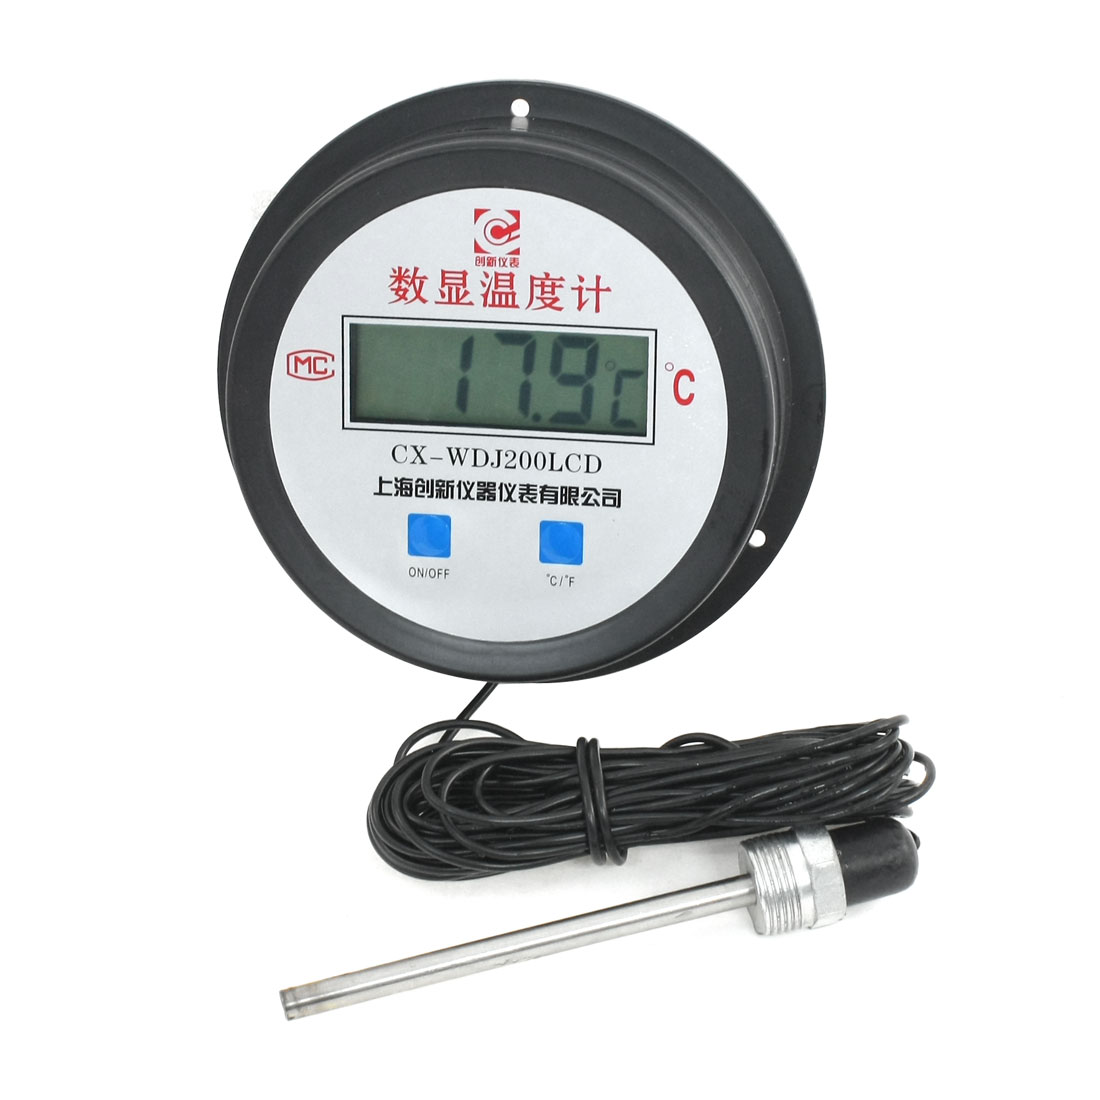 10meters Cable -50-200C Waterproof Temp Tester Digital Thermometer